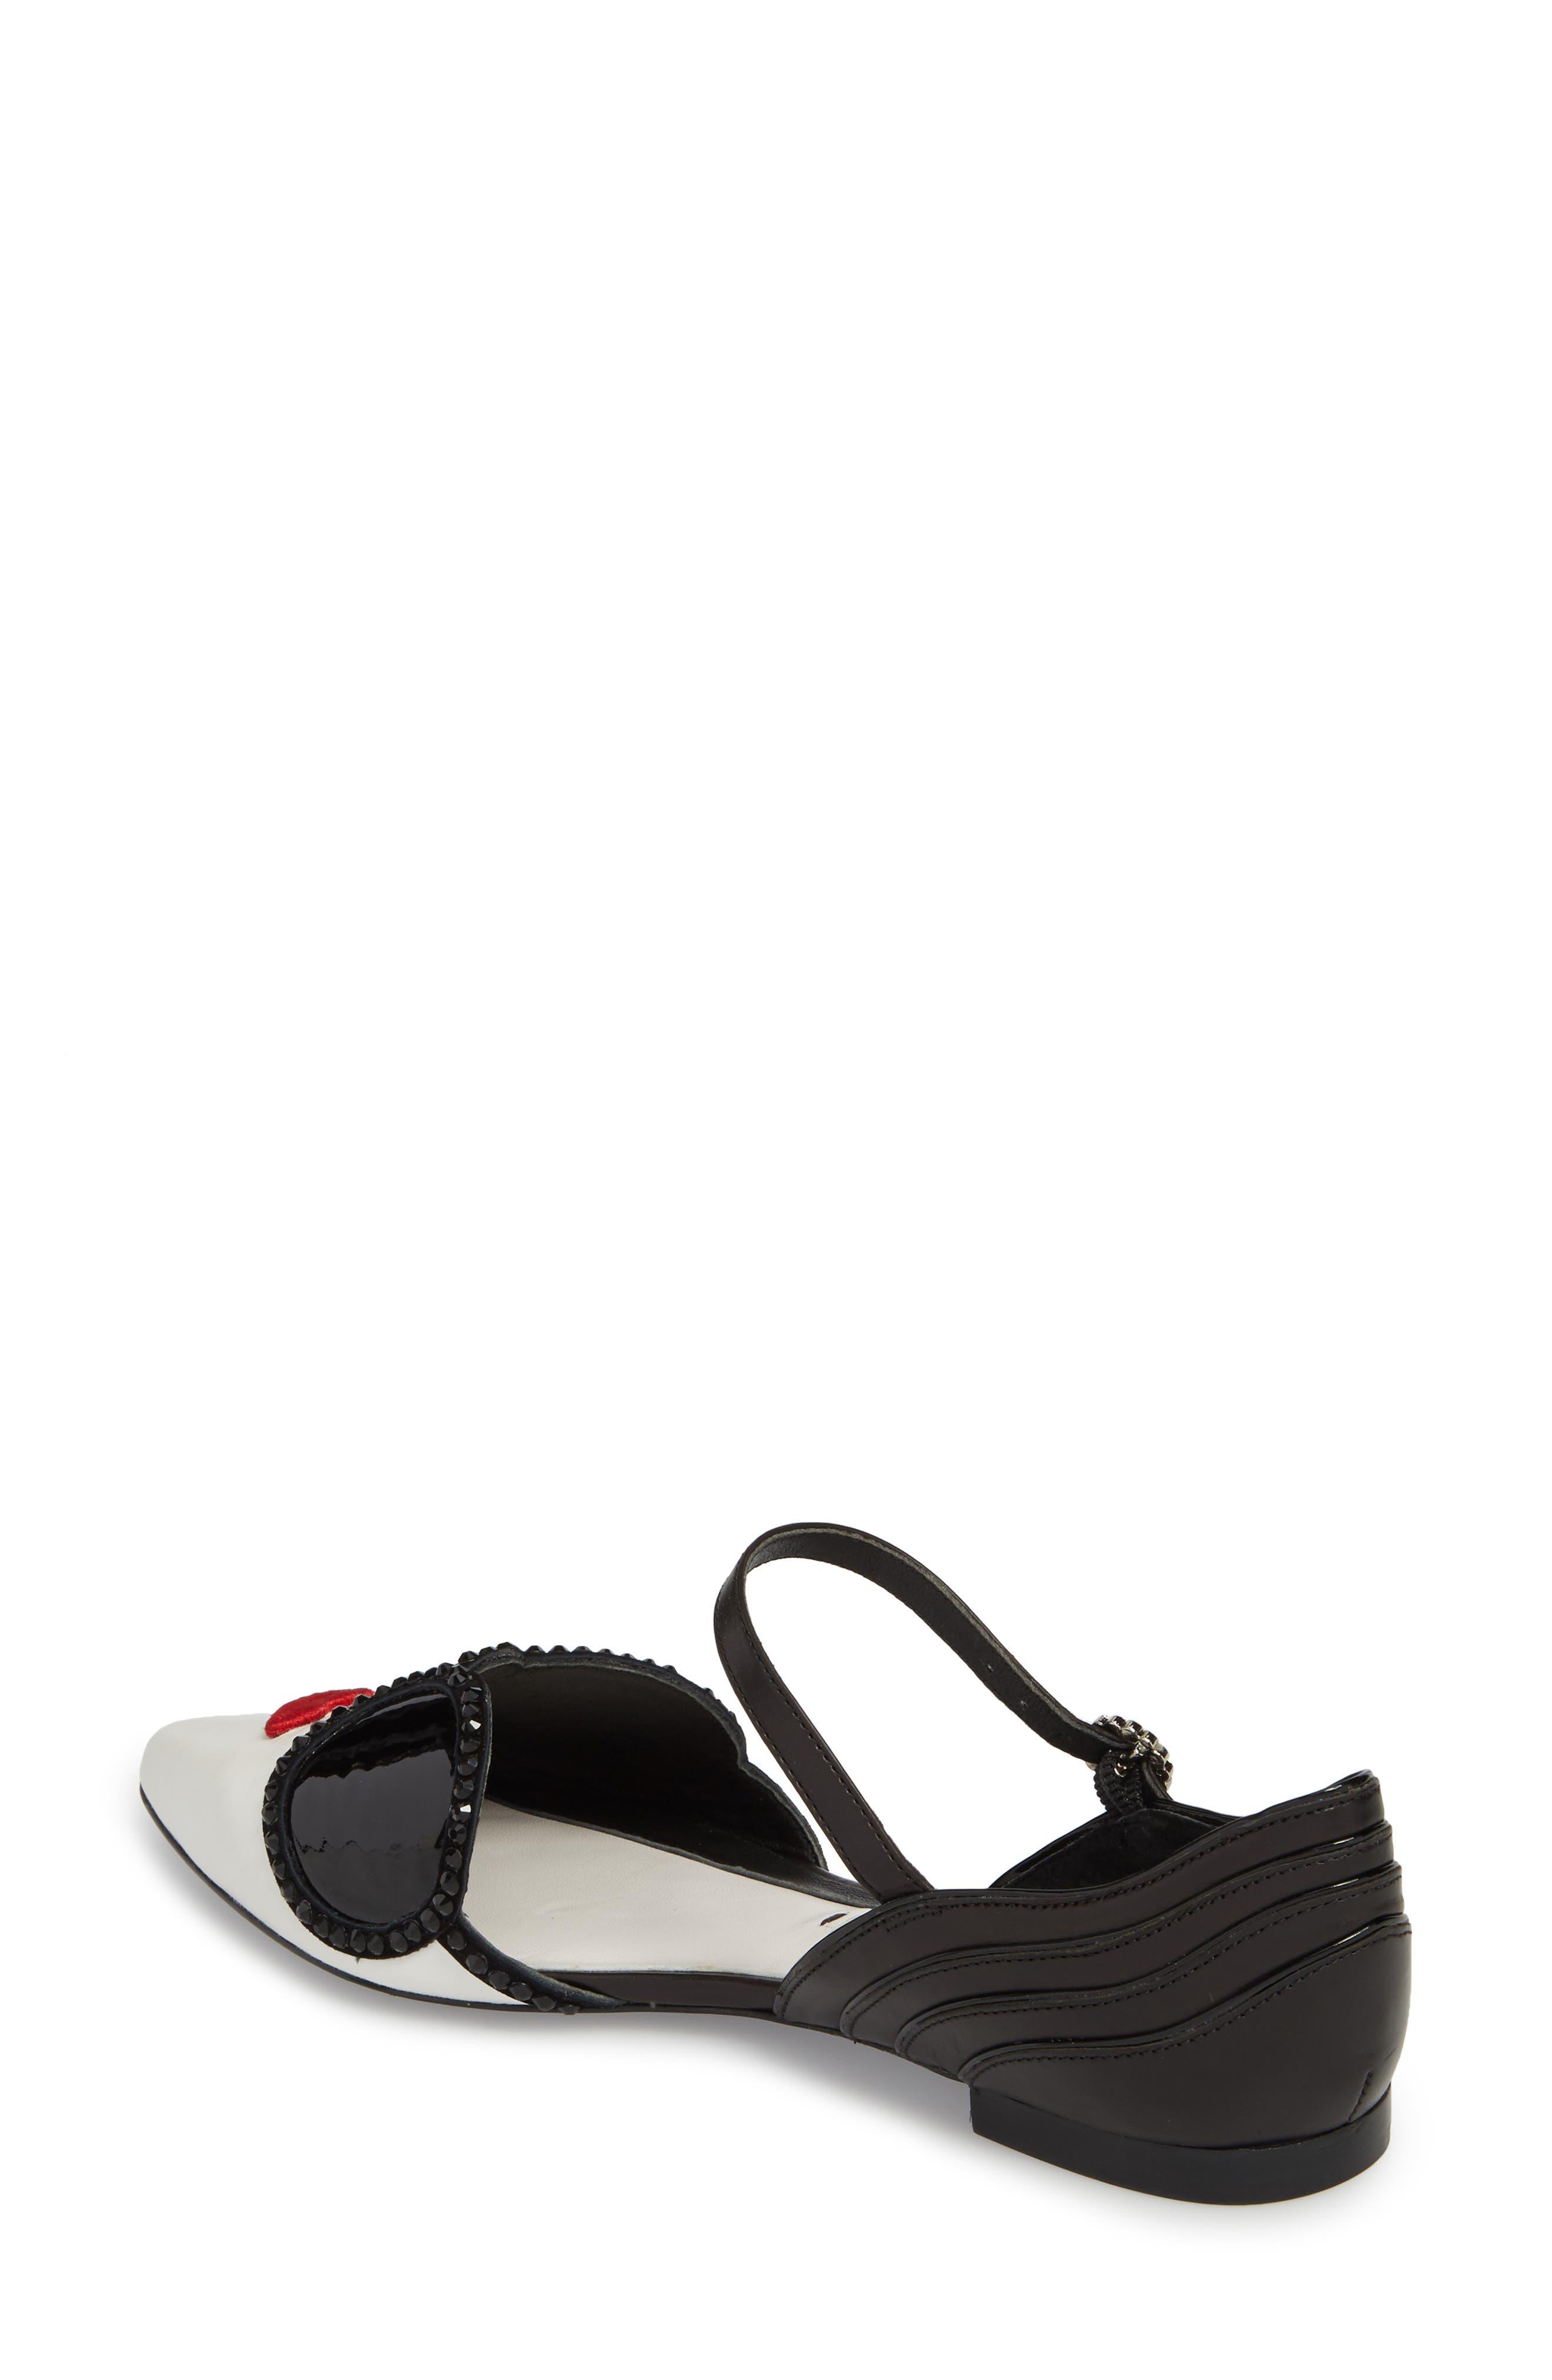 Lexi Embellished Pointy Toe Flat,                             Alternate thumbnail 2, color,                             Bianco/ Black/ Poppy